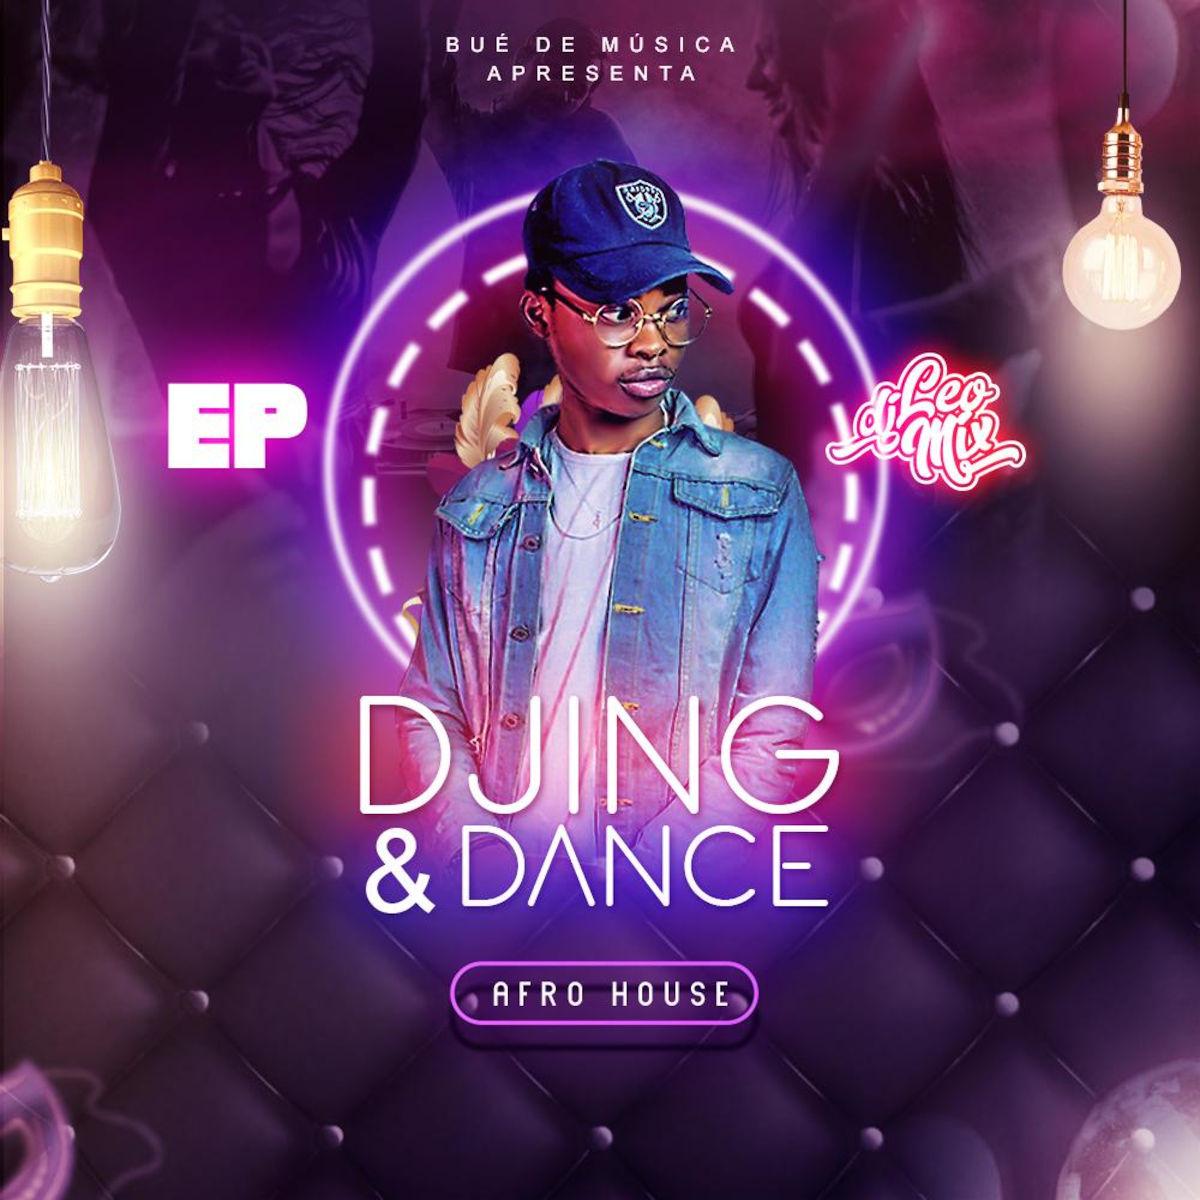 DJ Léo Mix - Djing & Dance EP • Download MP3